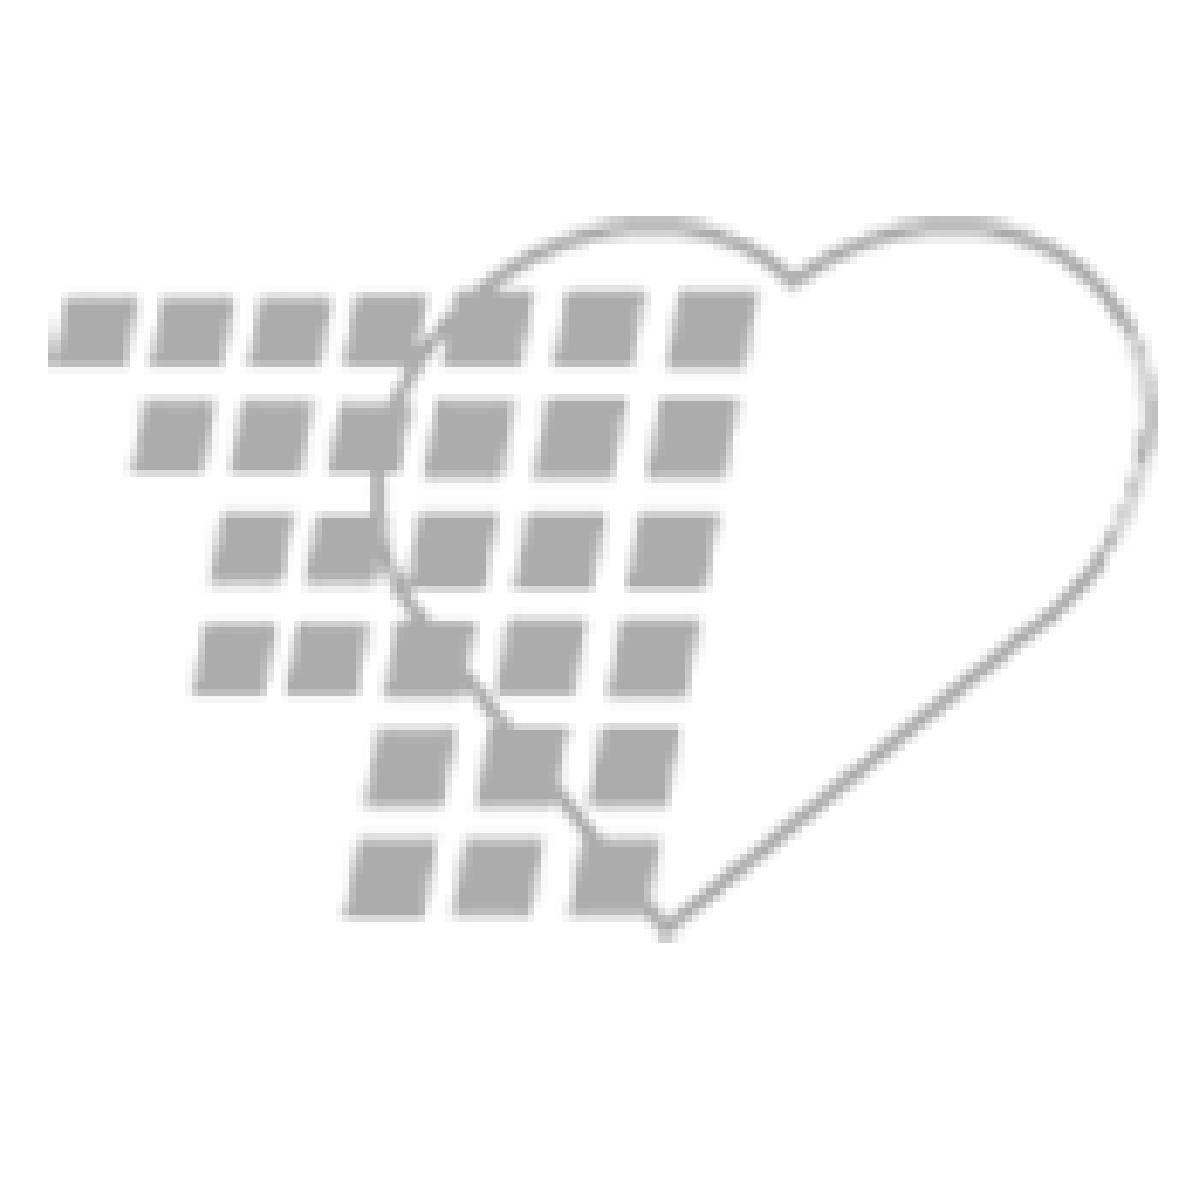 11-81-9570 Nasco Life/form® Enema Administration Simulator